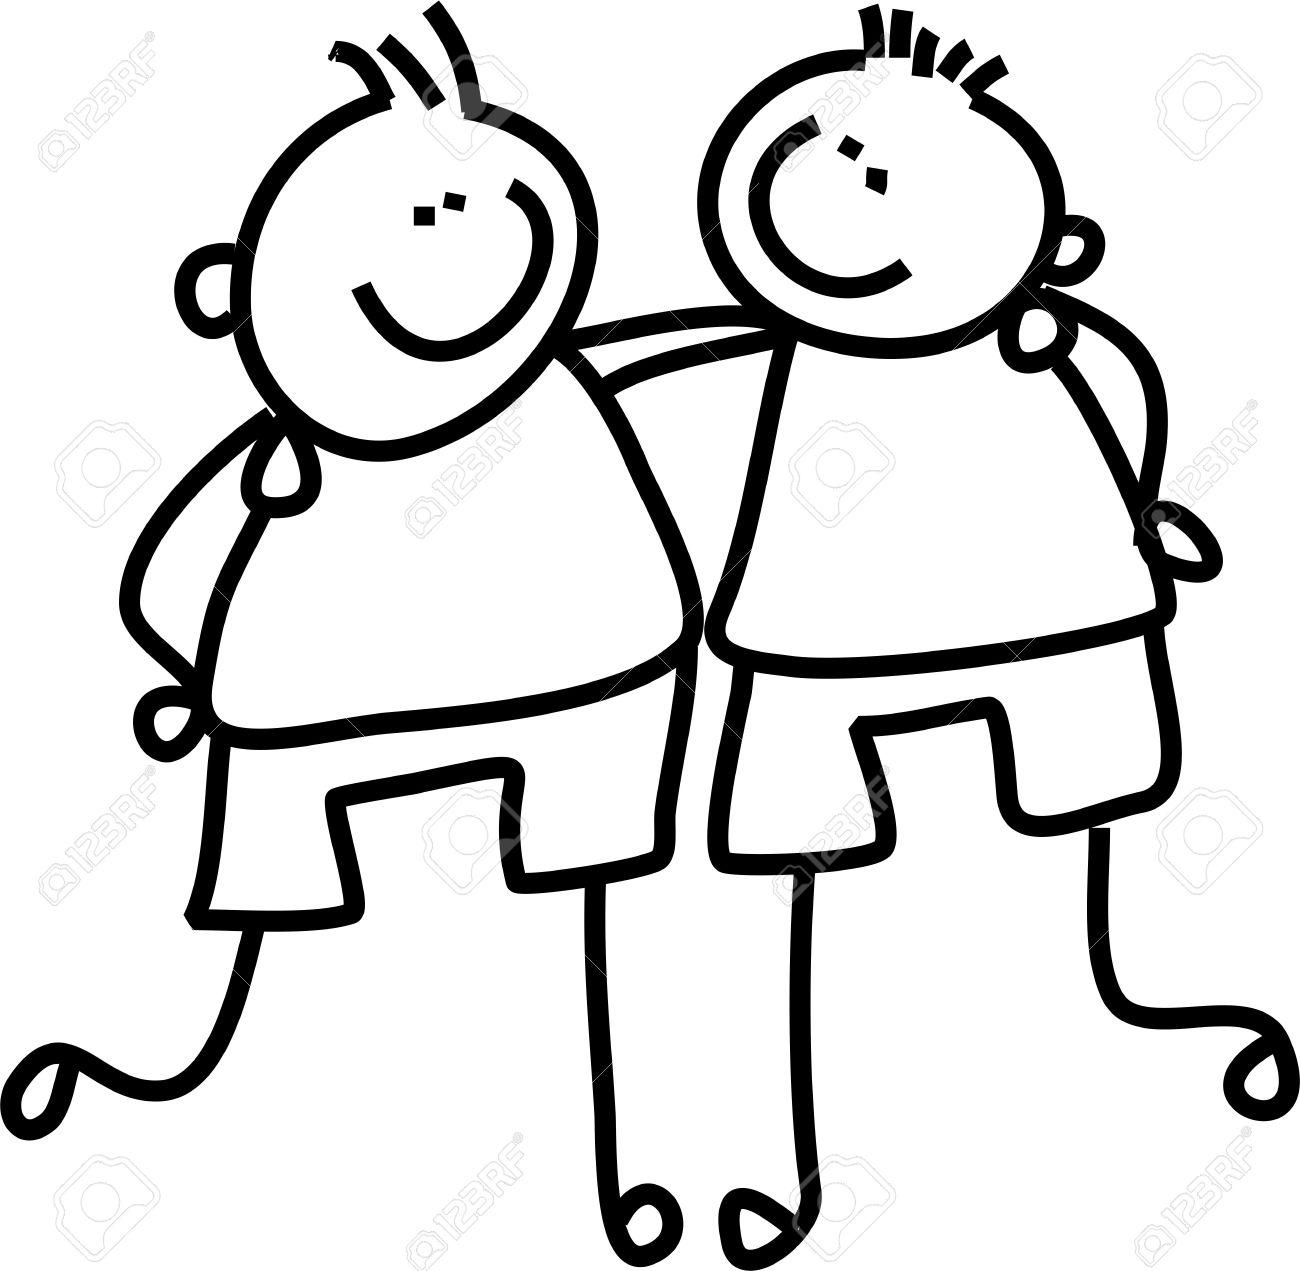 Three boys friendship clipart black and white image black and white Two Friends PNG Black And White Transparent Two Friends ... image black and white